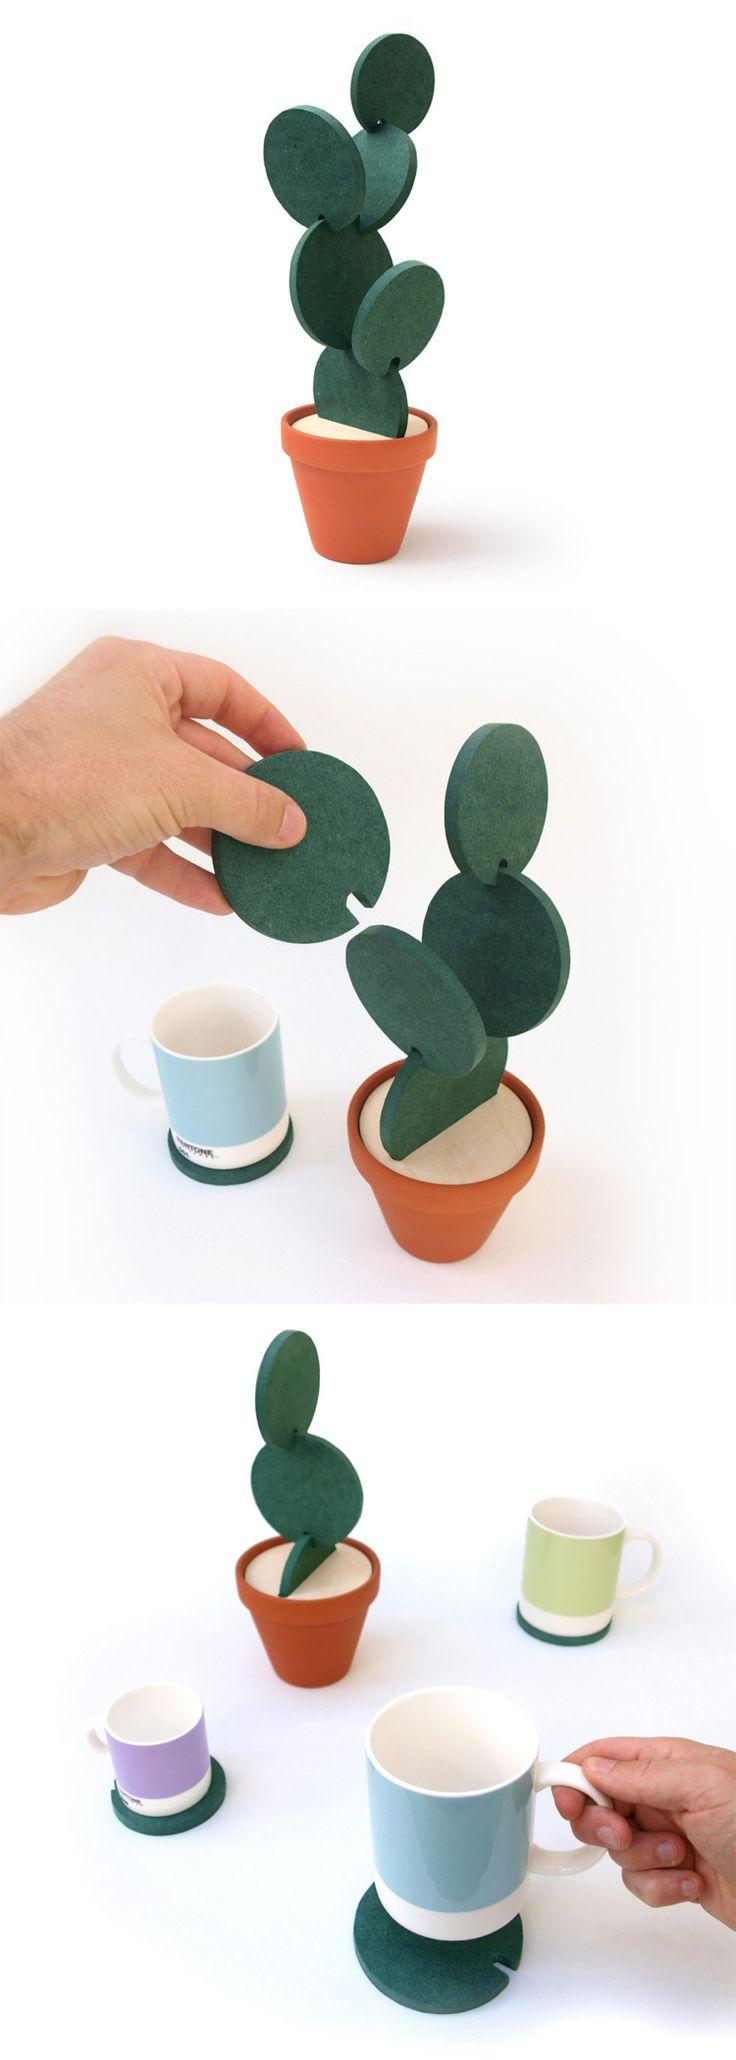 Cacti Coasters by designer Clive Roddy